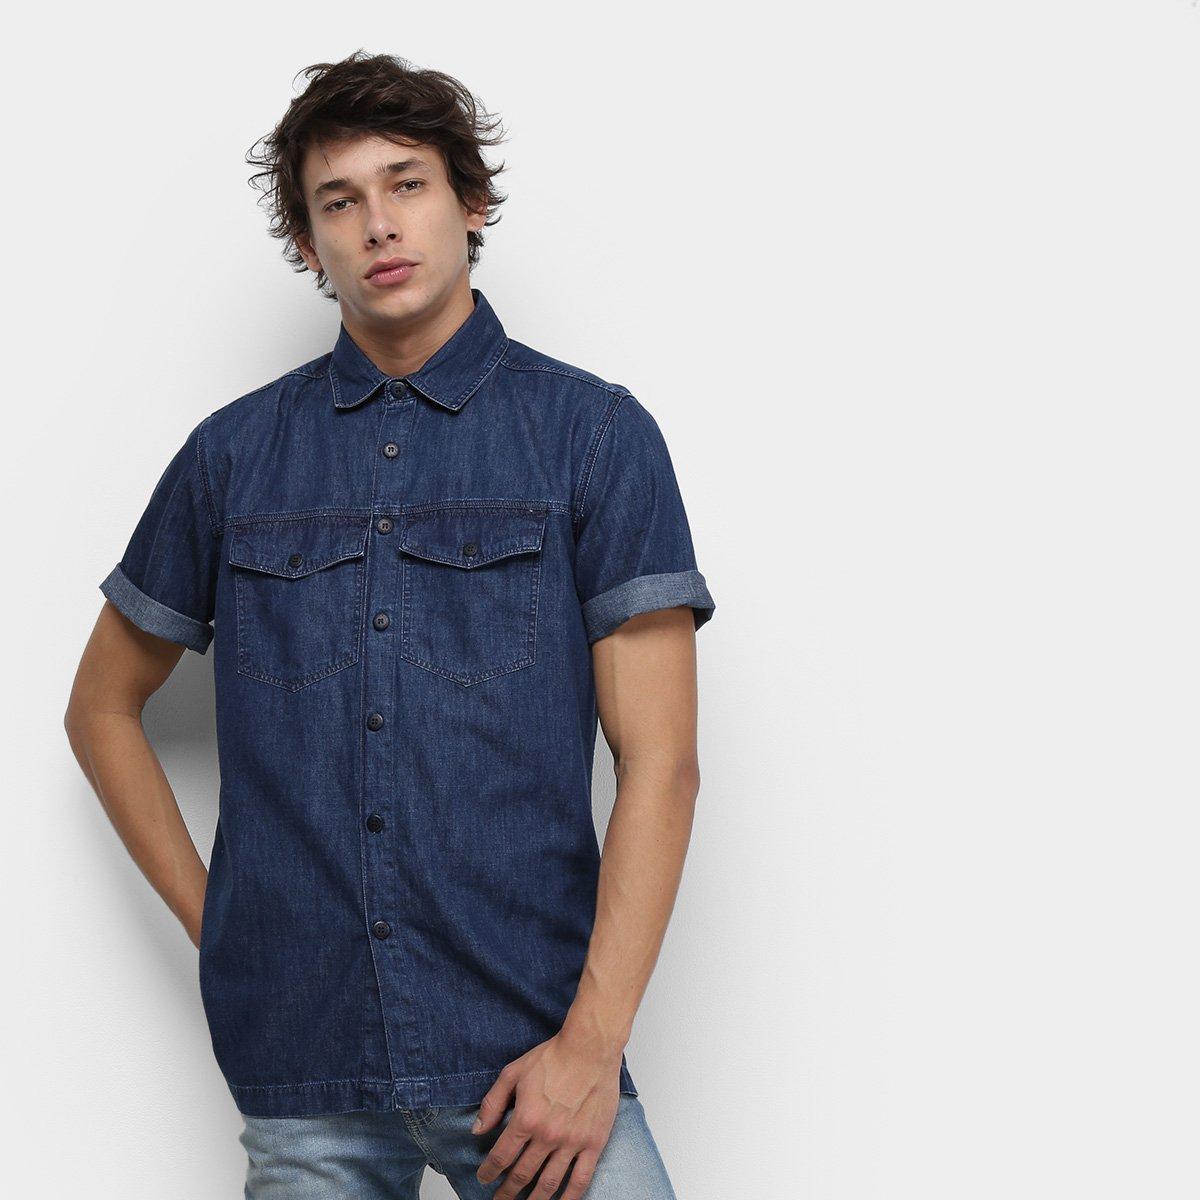 Foto 1 - Camisa Jeans Tommy Jeans Workerwear Denim Masculino